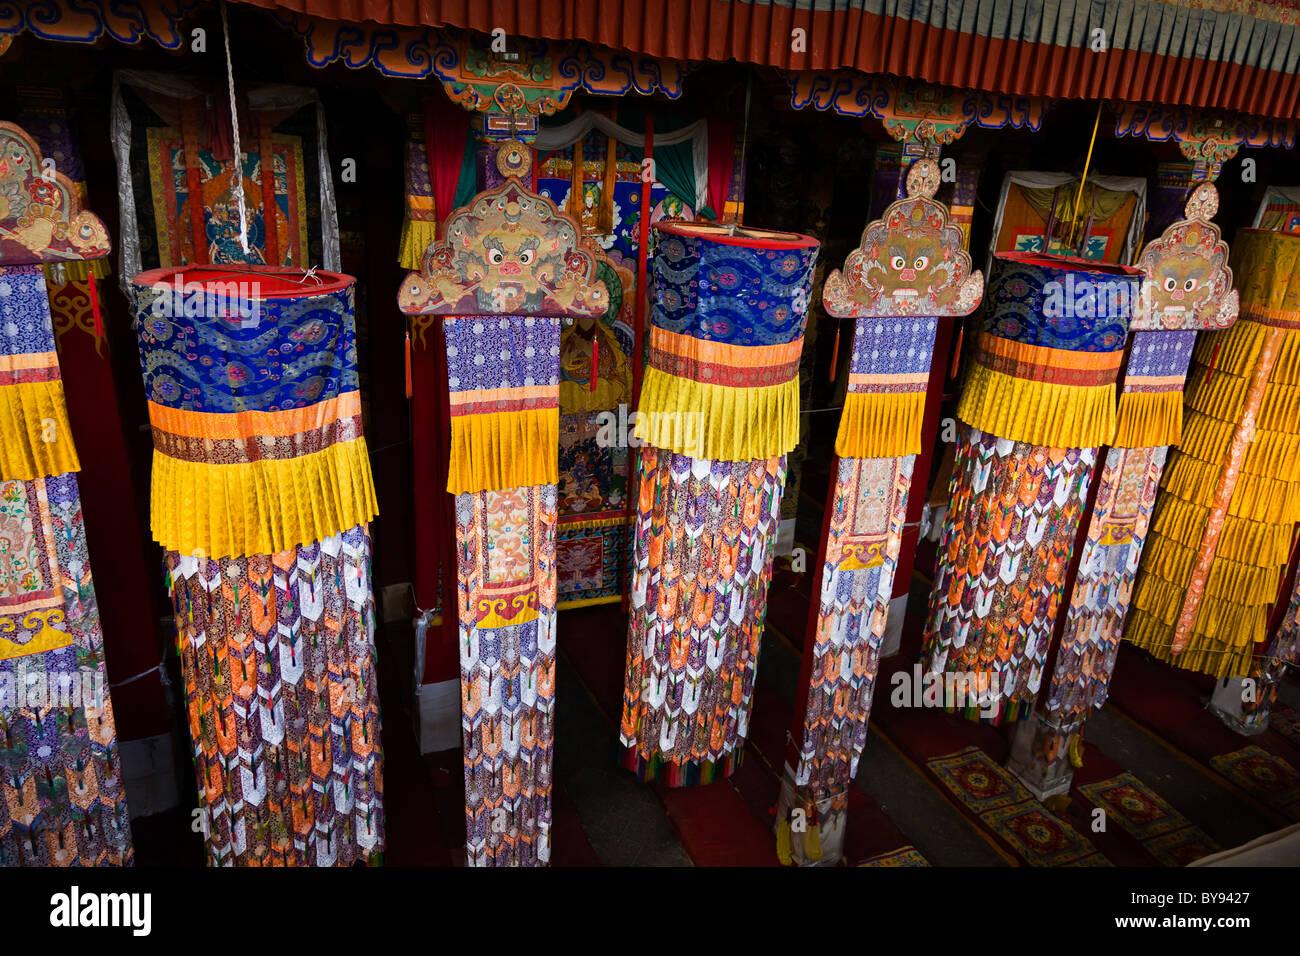 Hanging decorations in the Prayer Hall at Drepung Monastery, Lhasa, Tibet. JMH4549 - Stock Image